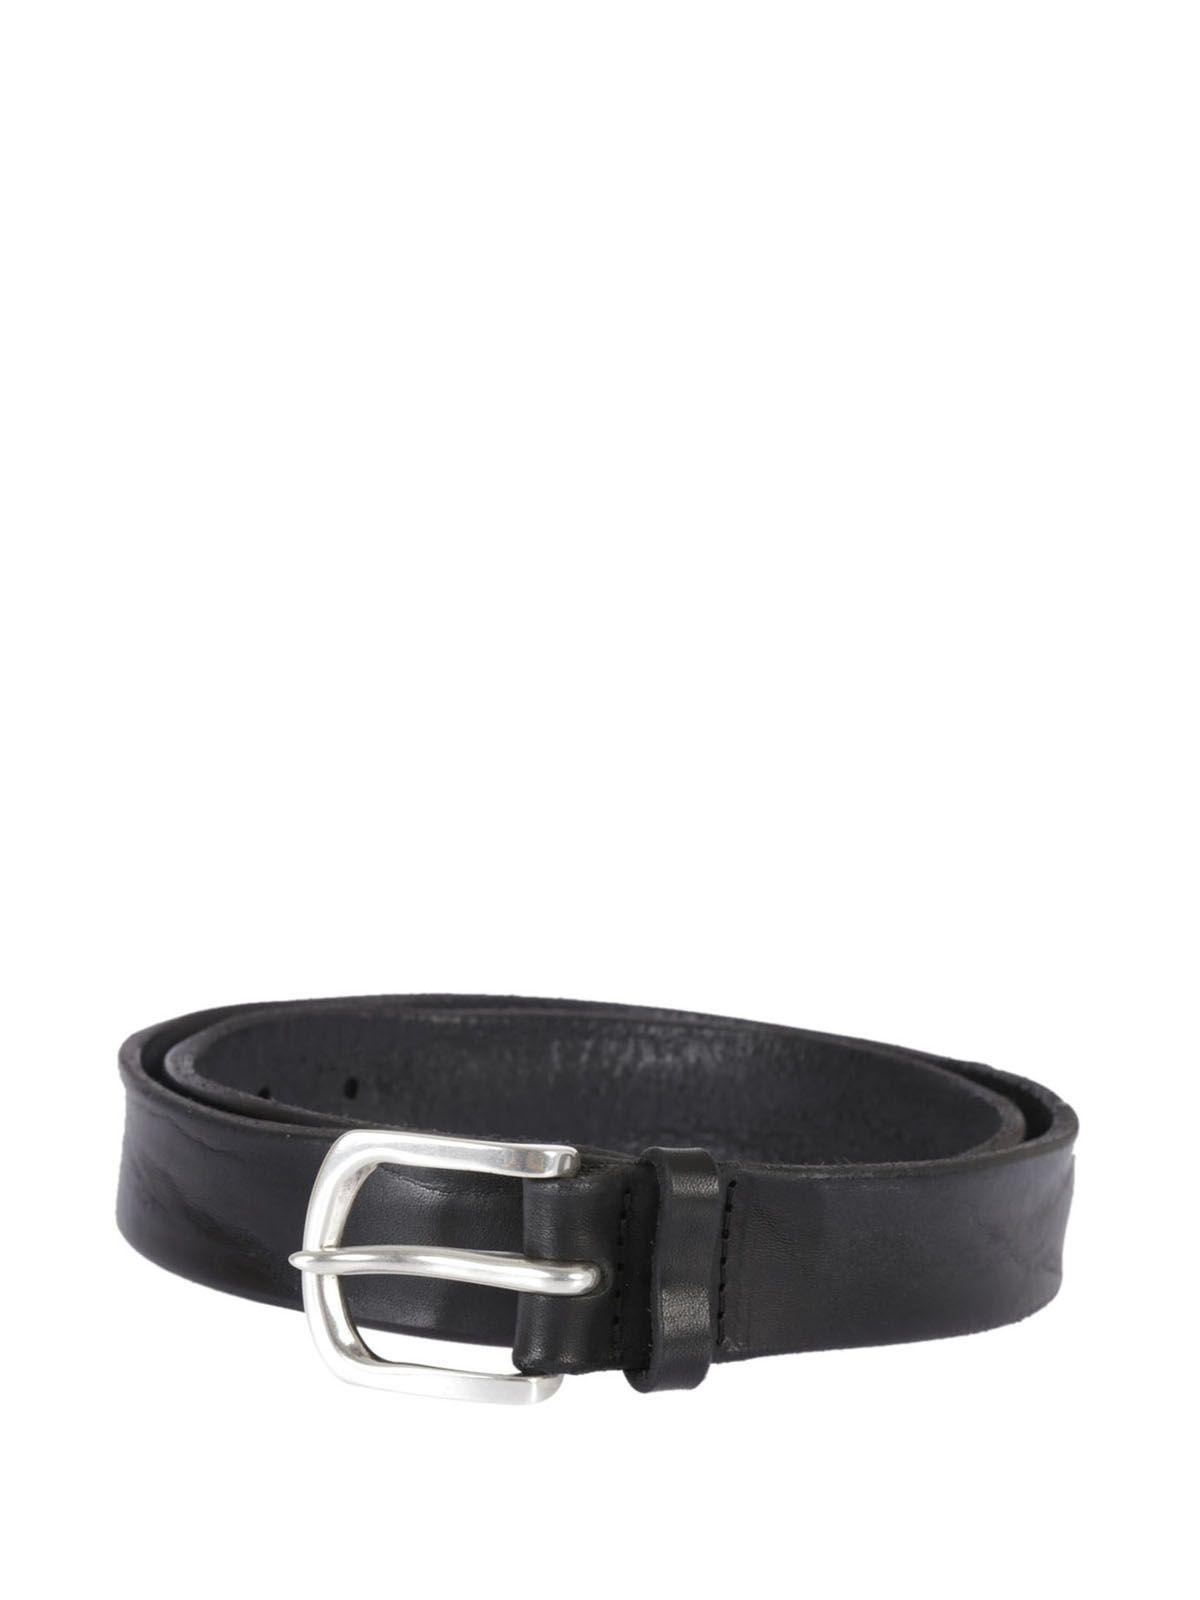 Orciani Bull Soft Belt In Black